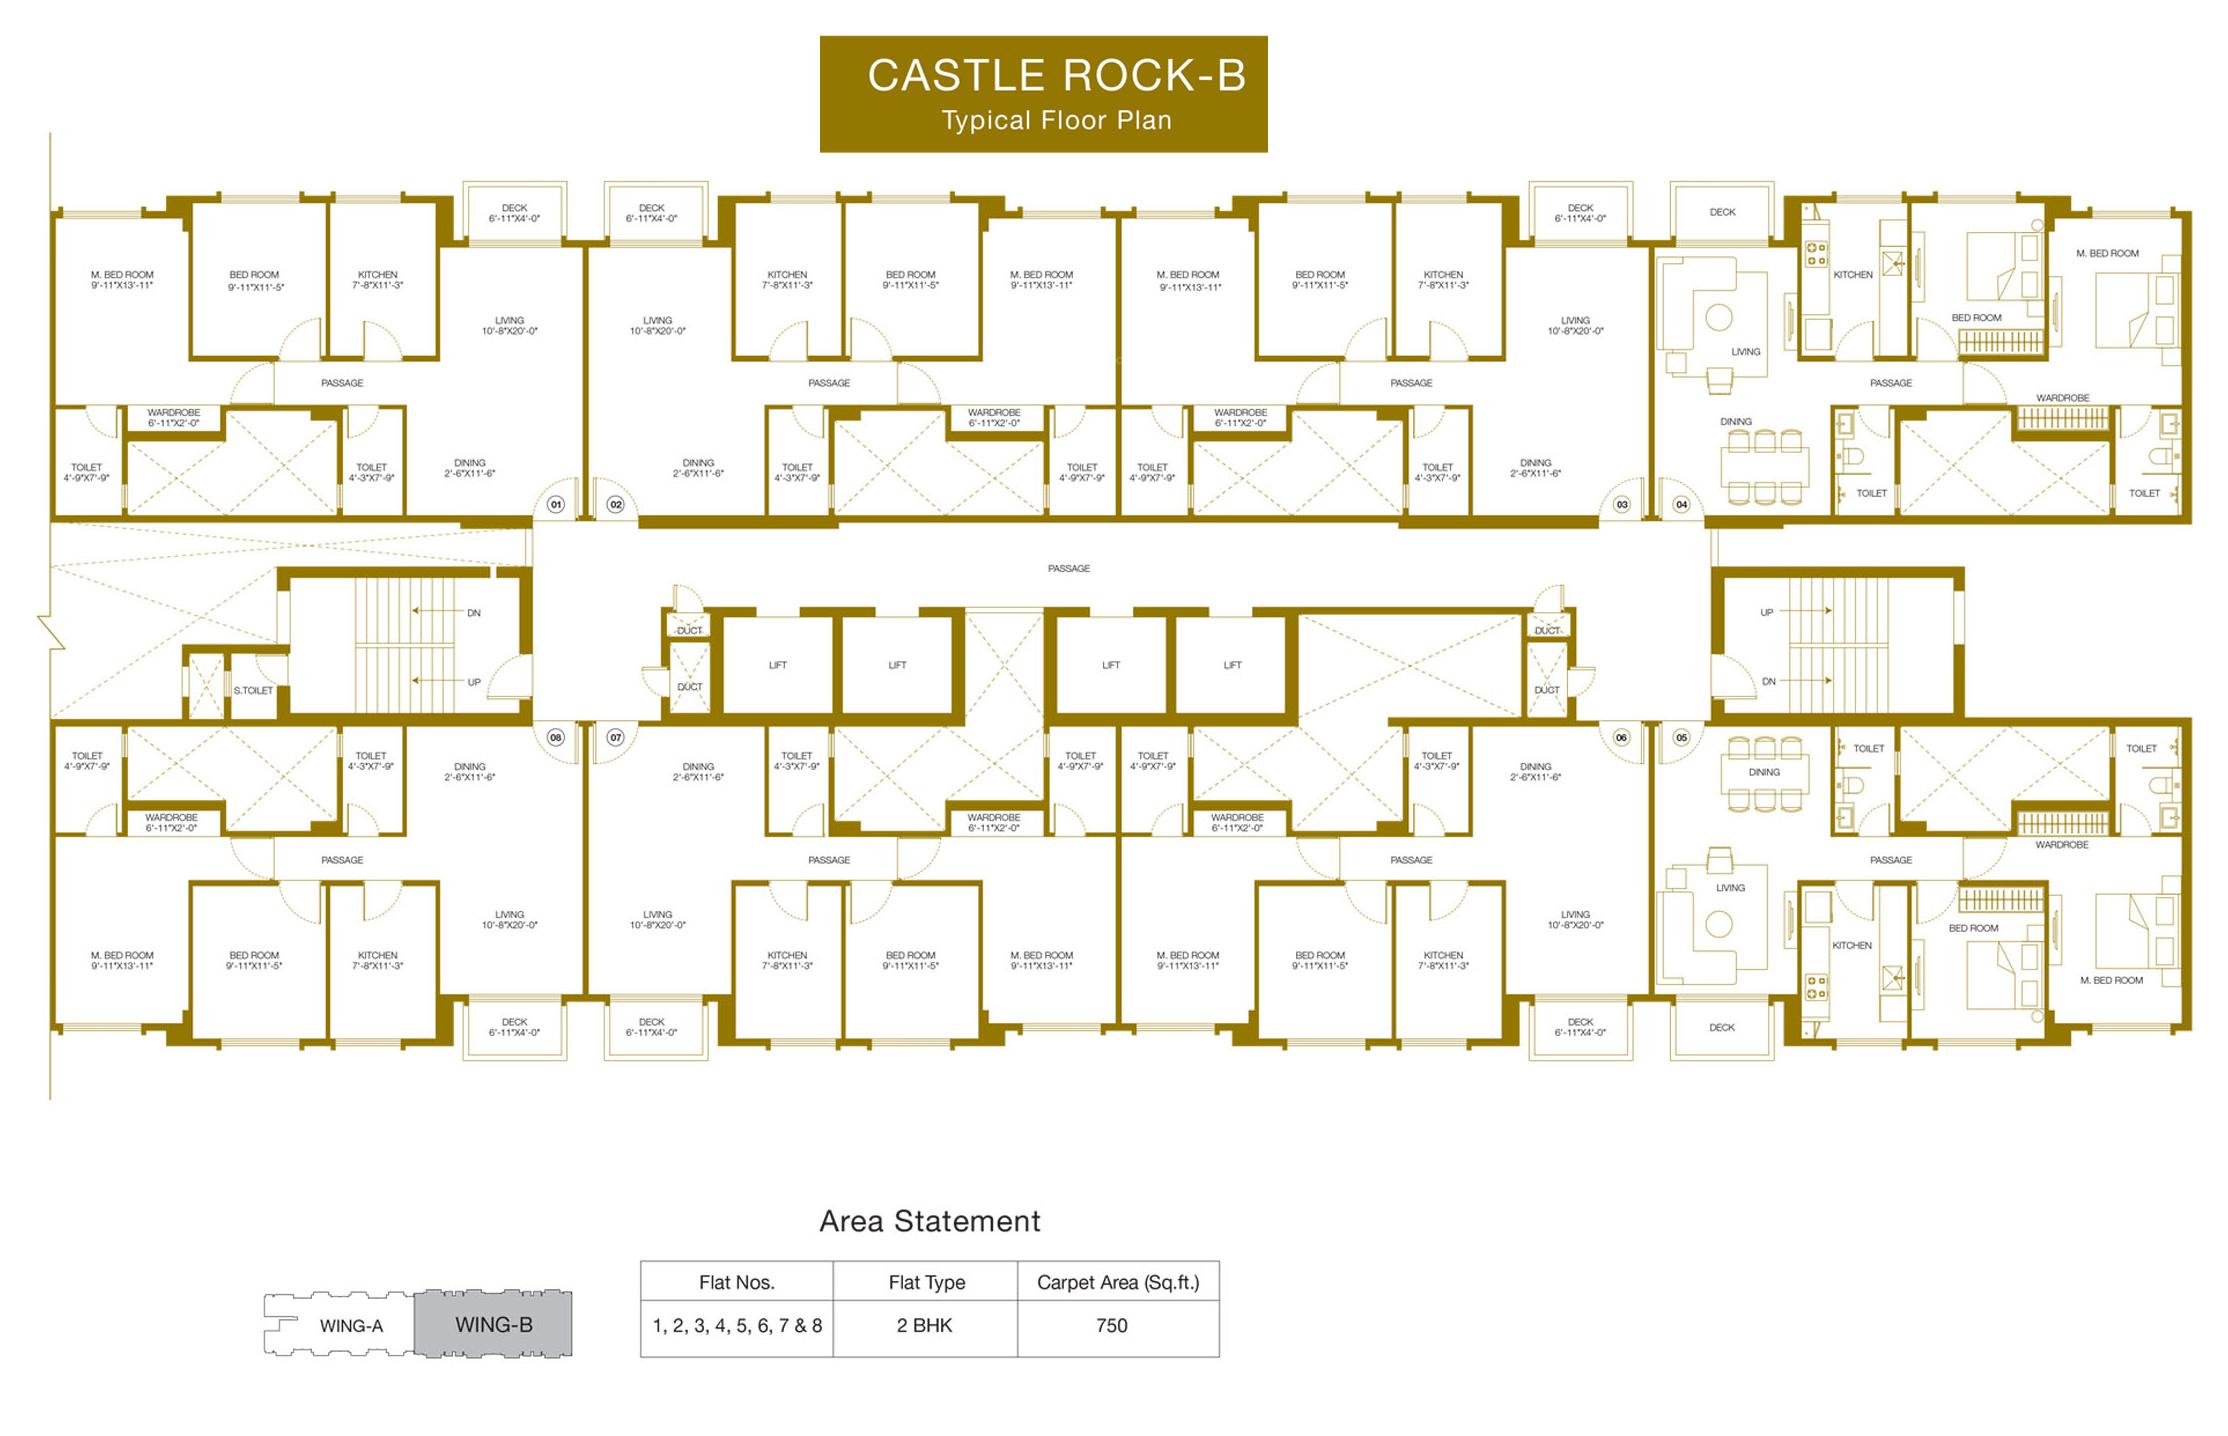 Hiranandani castle rock in powai mumbai price location for Castle rock floor plans